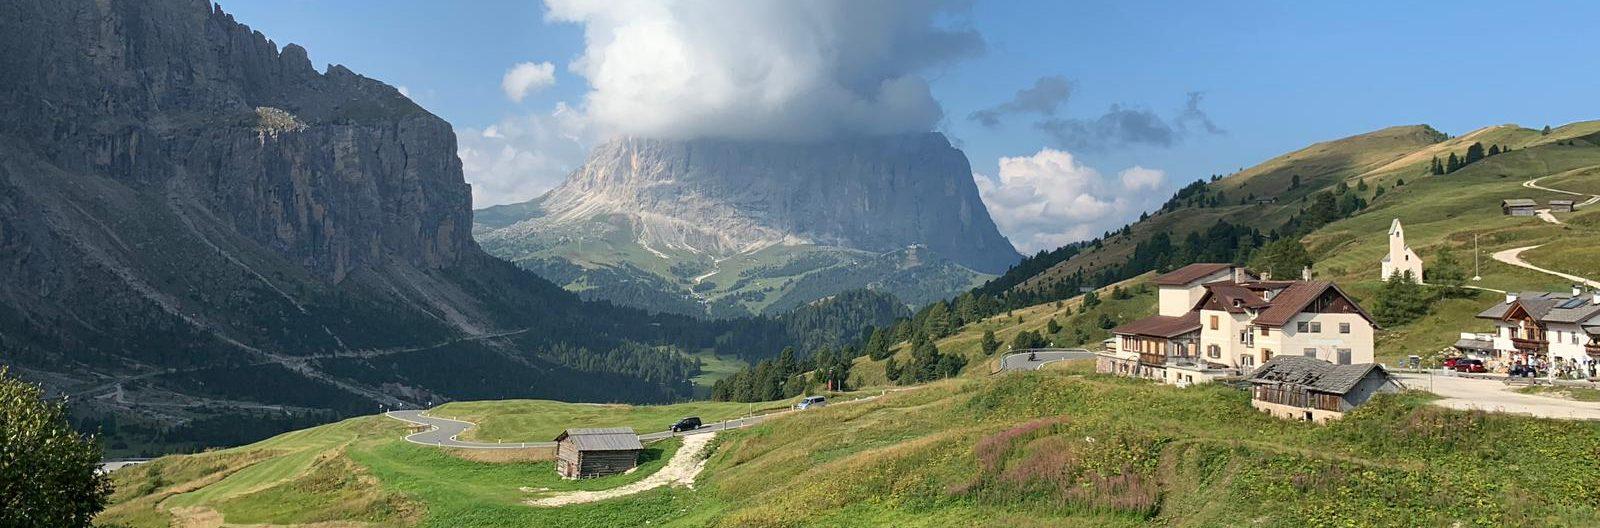 Photo of Gardena Pass in the Dolomites